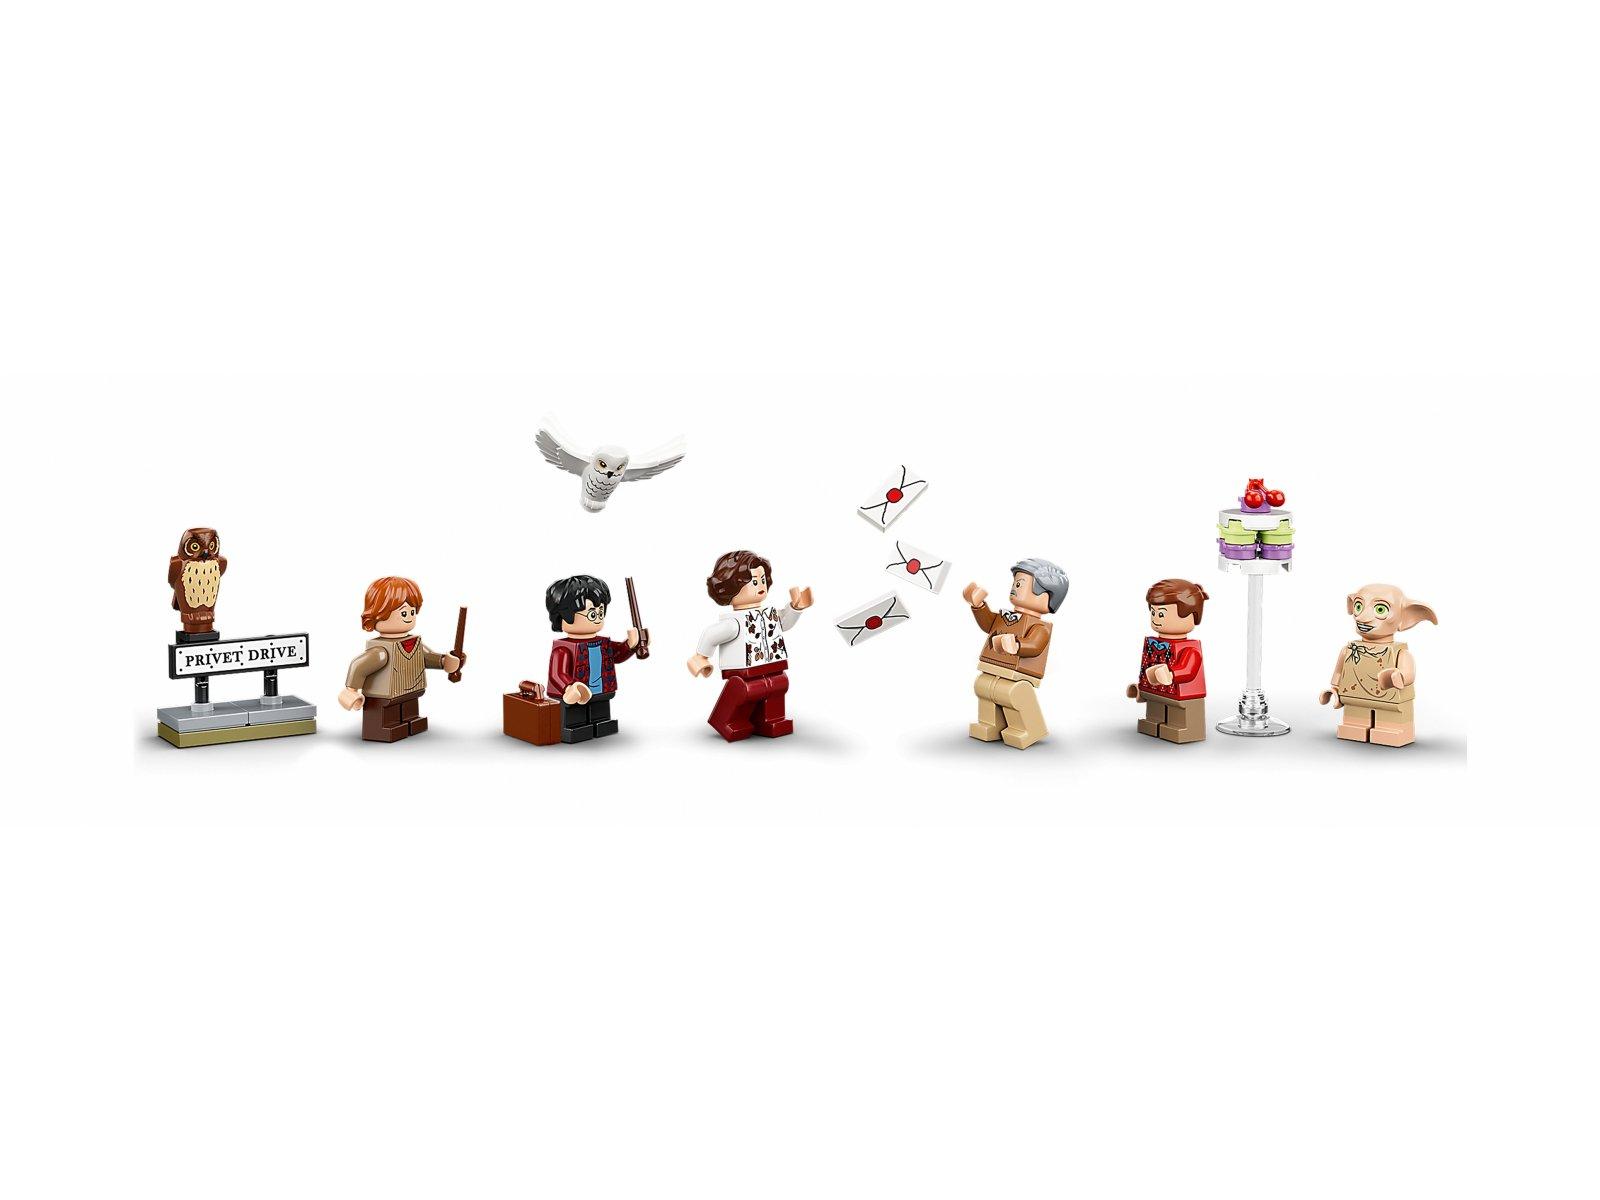 LEGO 75968 Privet Drive 4